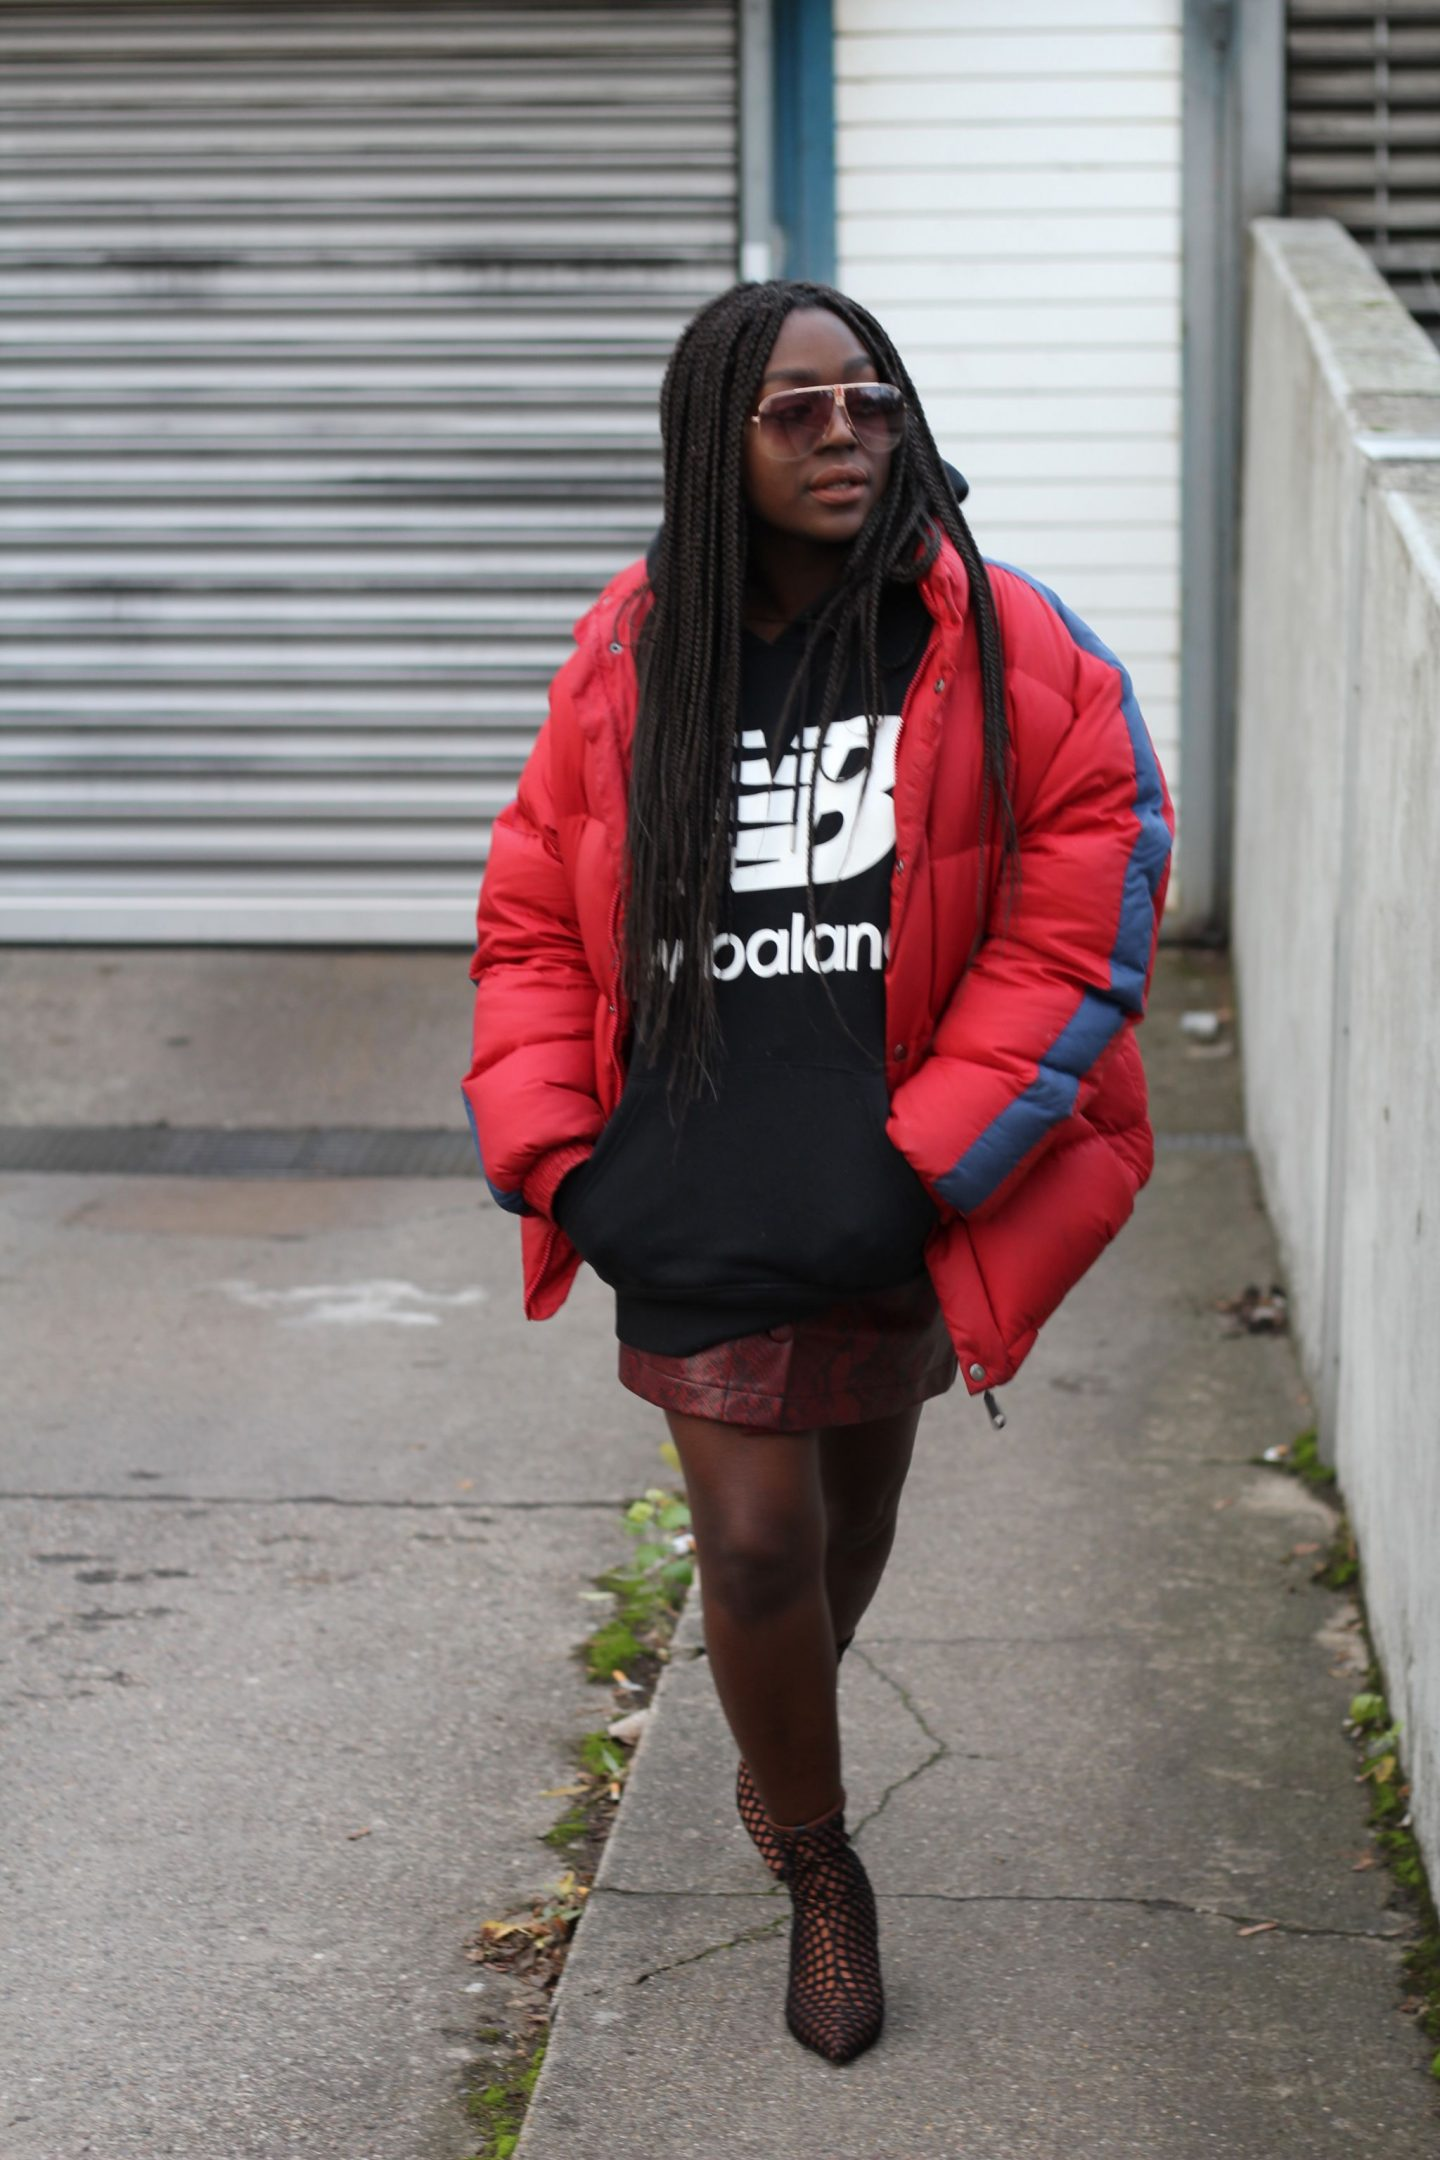 streetwear_chic_lois_opoku_fashion_blog_style_berlin_lisforlois_2